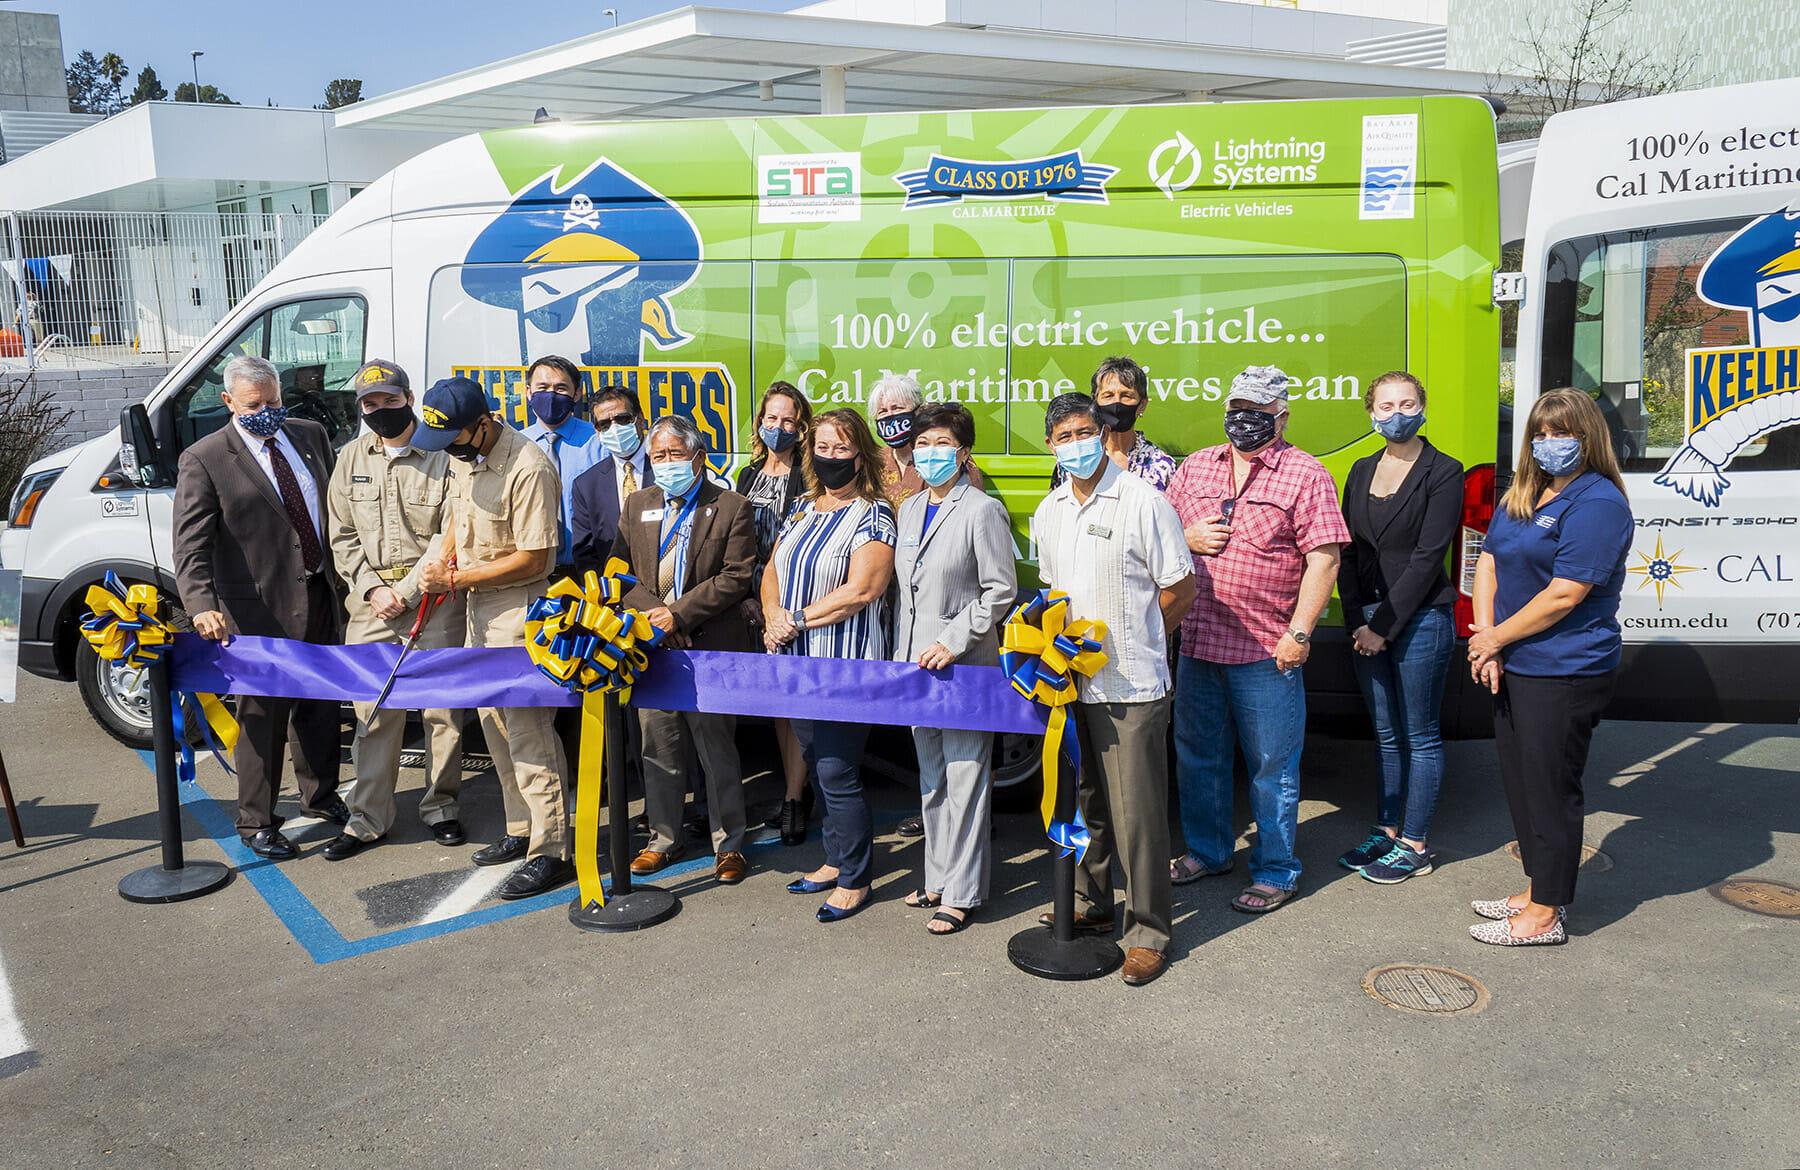 Cal Maritime ribbon-cutting for new electric shuttle van